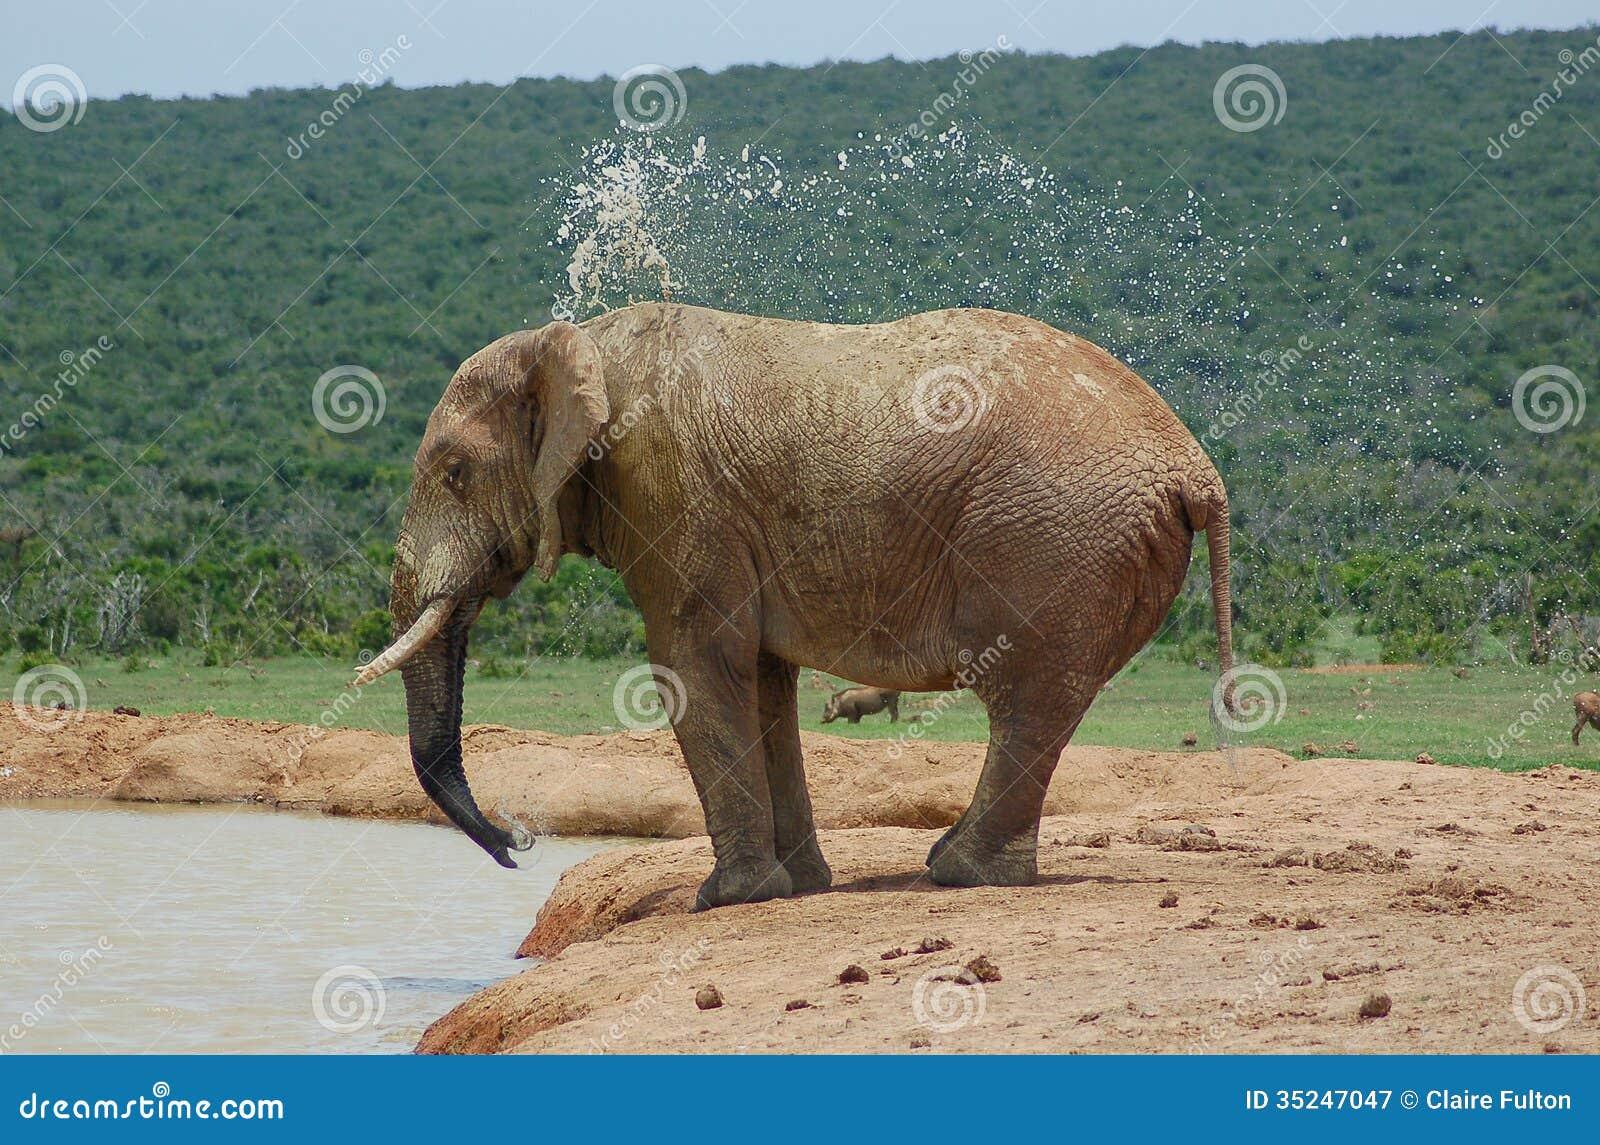 Elephant spraying water - photo#21